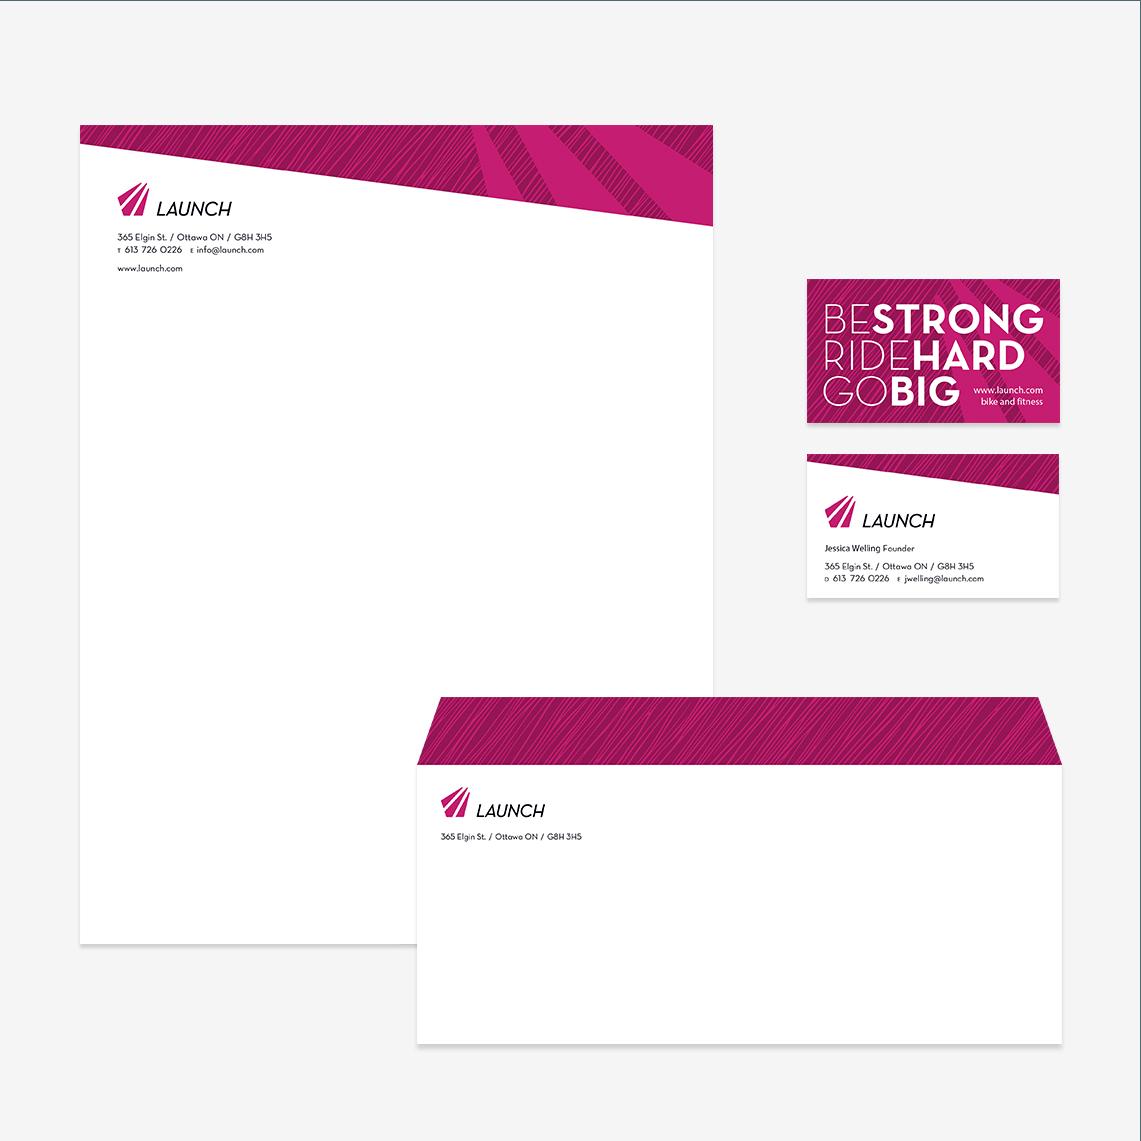 launch brand stationary design